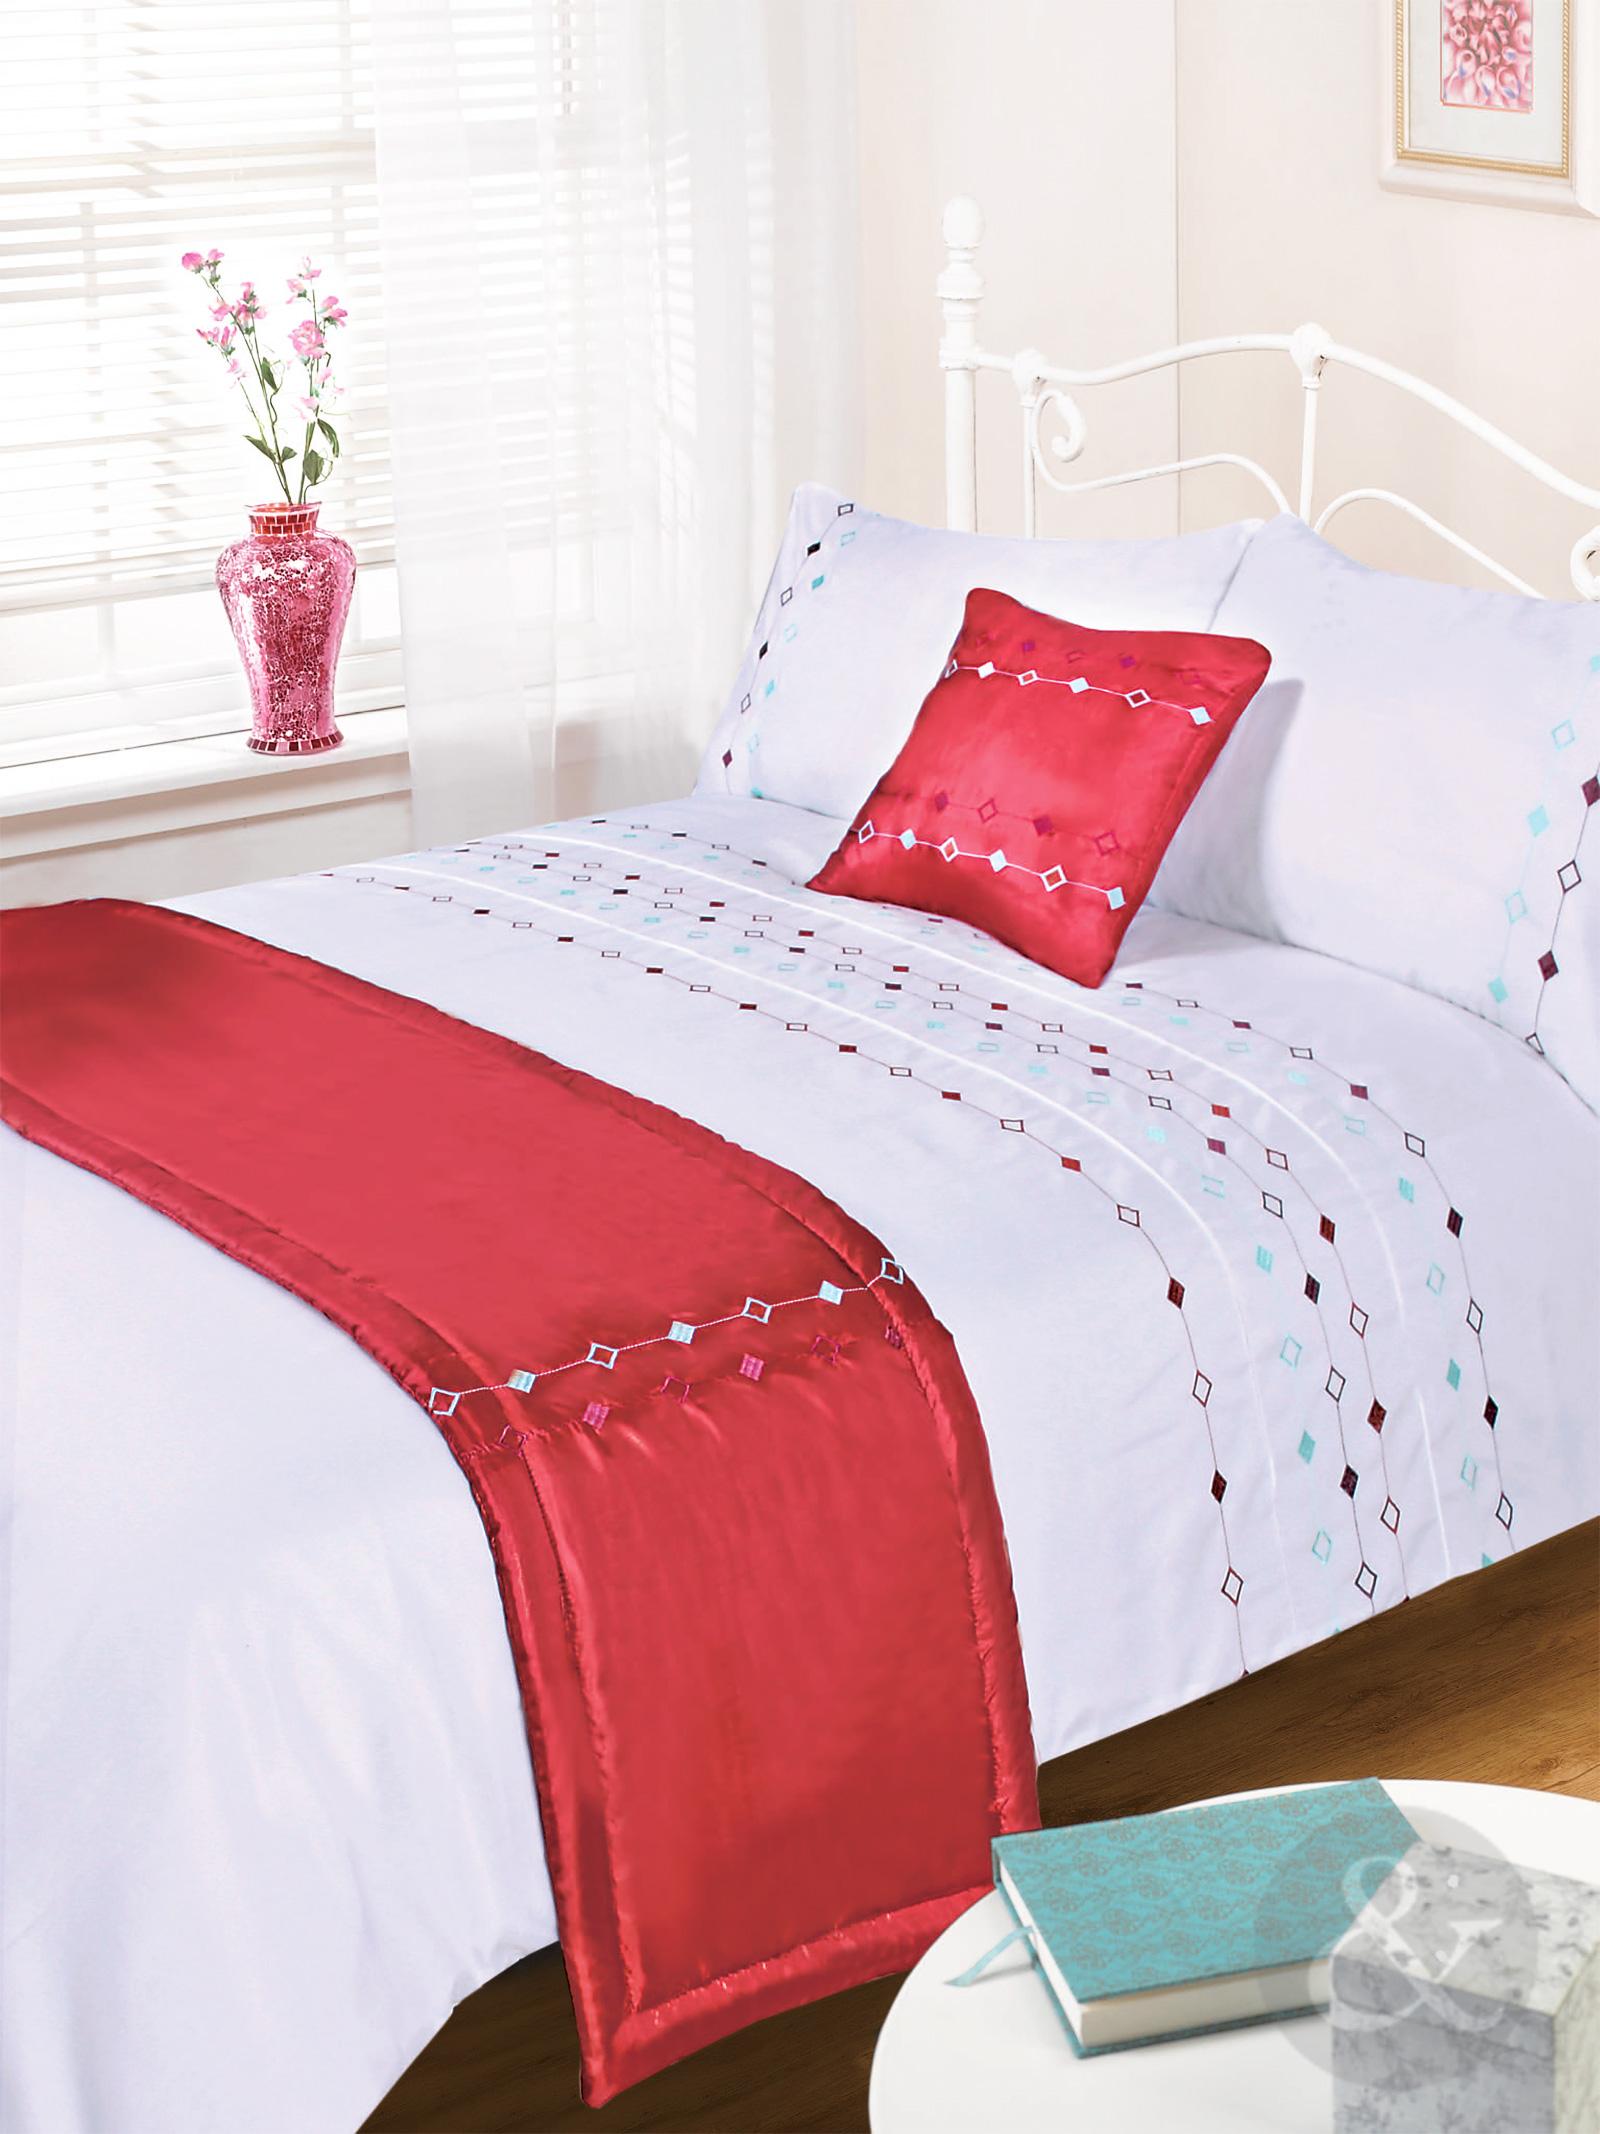 terracotta duvet covers 19 images buy terracotta. Black Bedroom Furniture Sets. Home Design Ideas